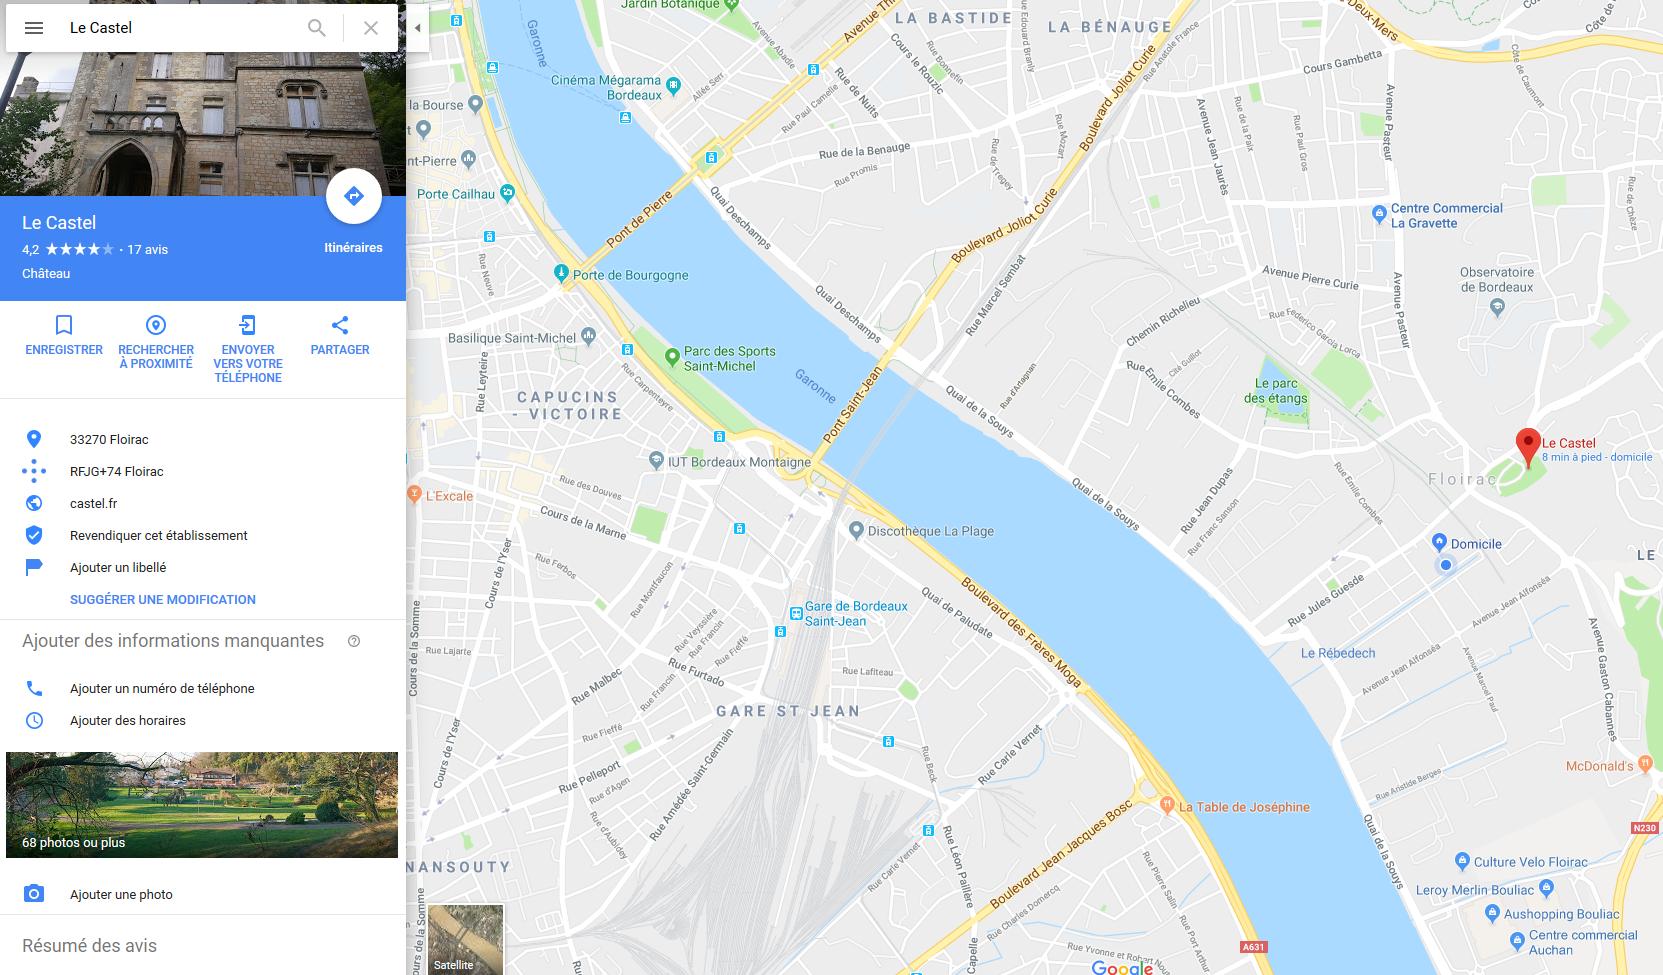 Rencontre sur Floirac (Bordeaux) en octobre JYgXk